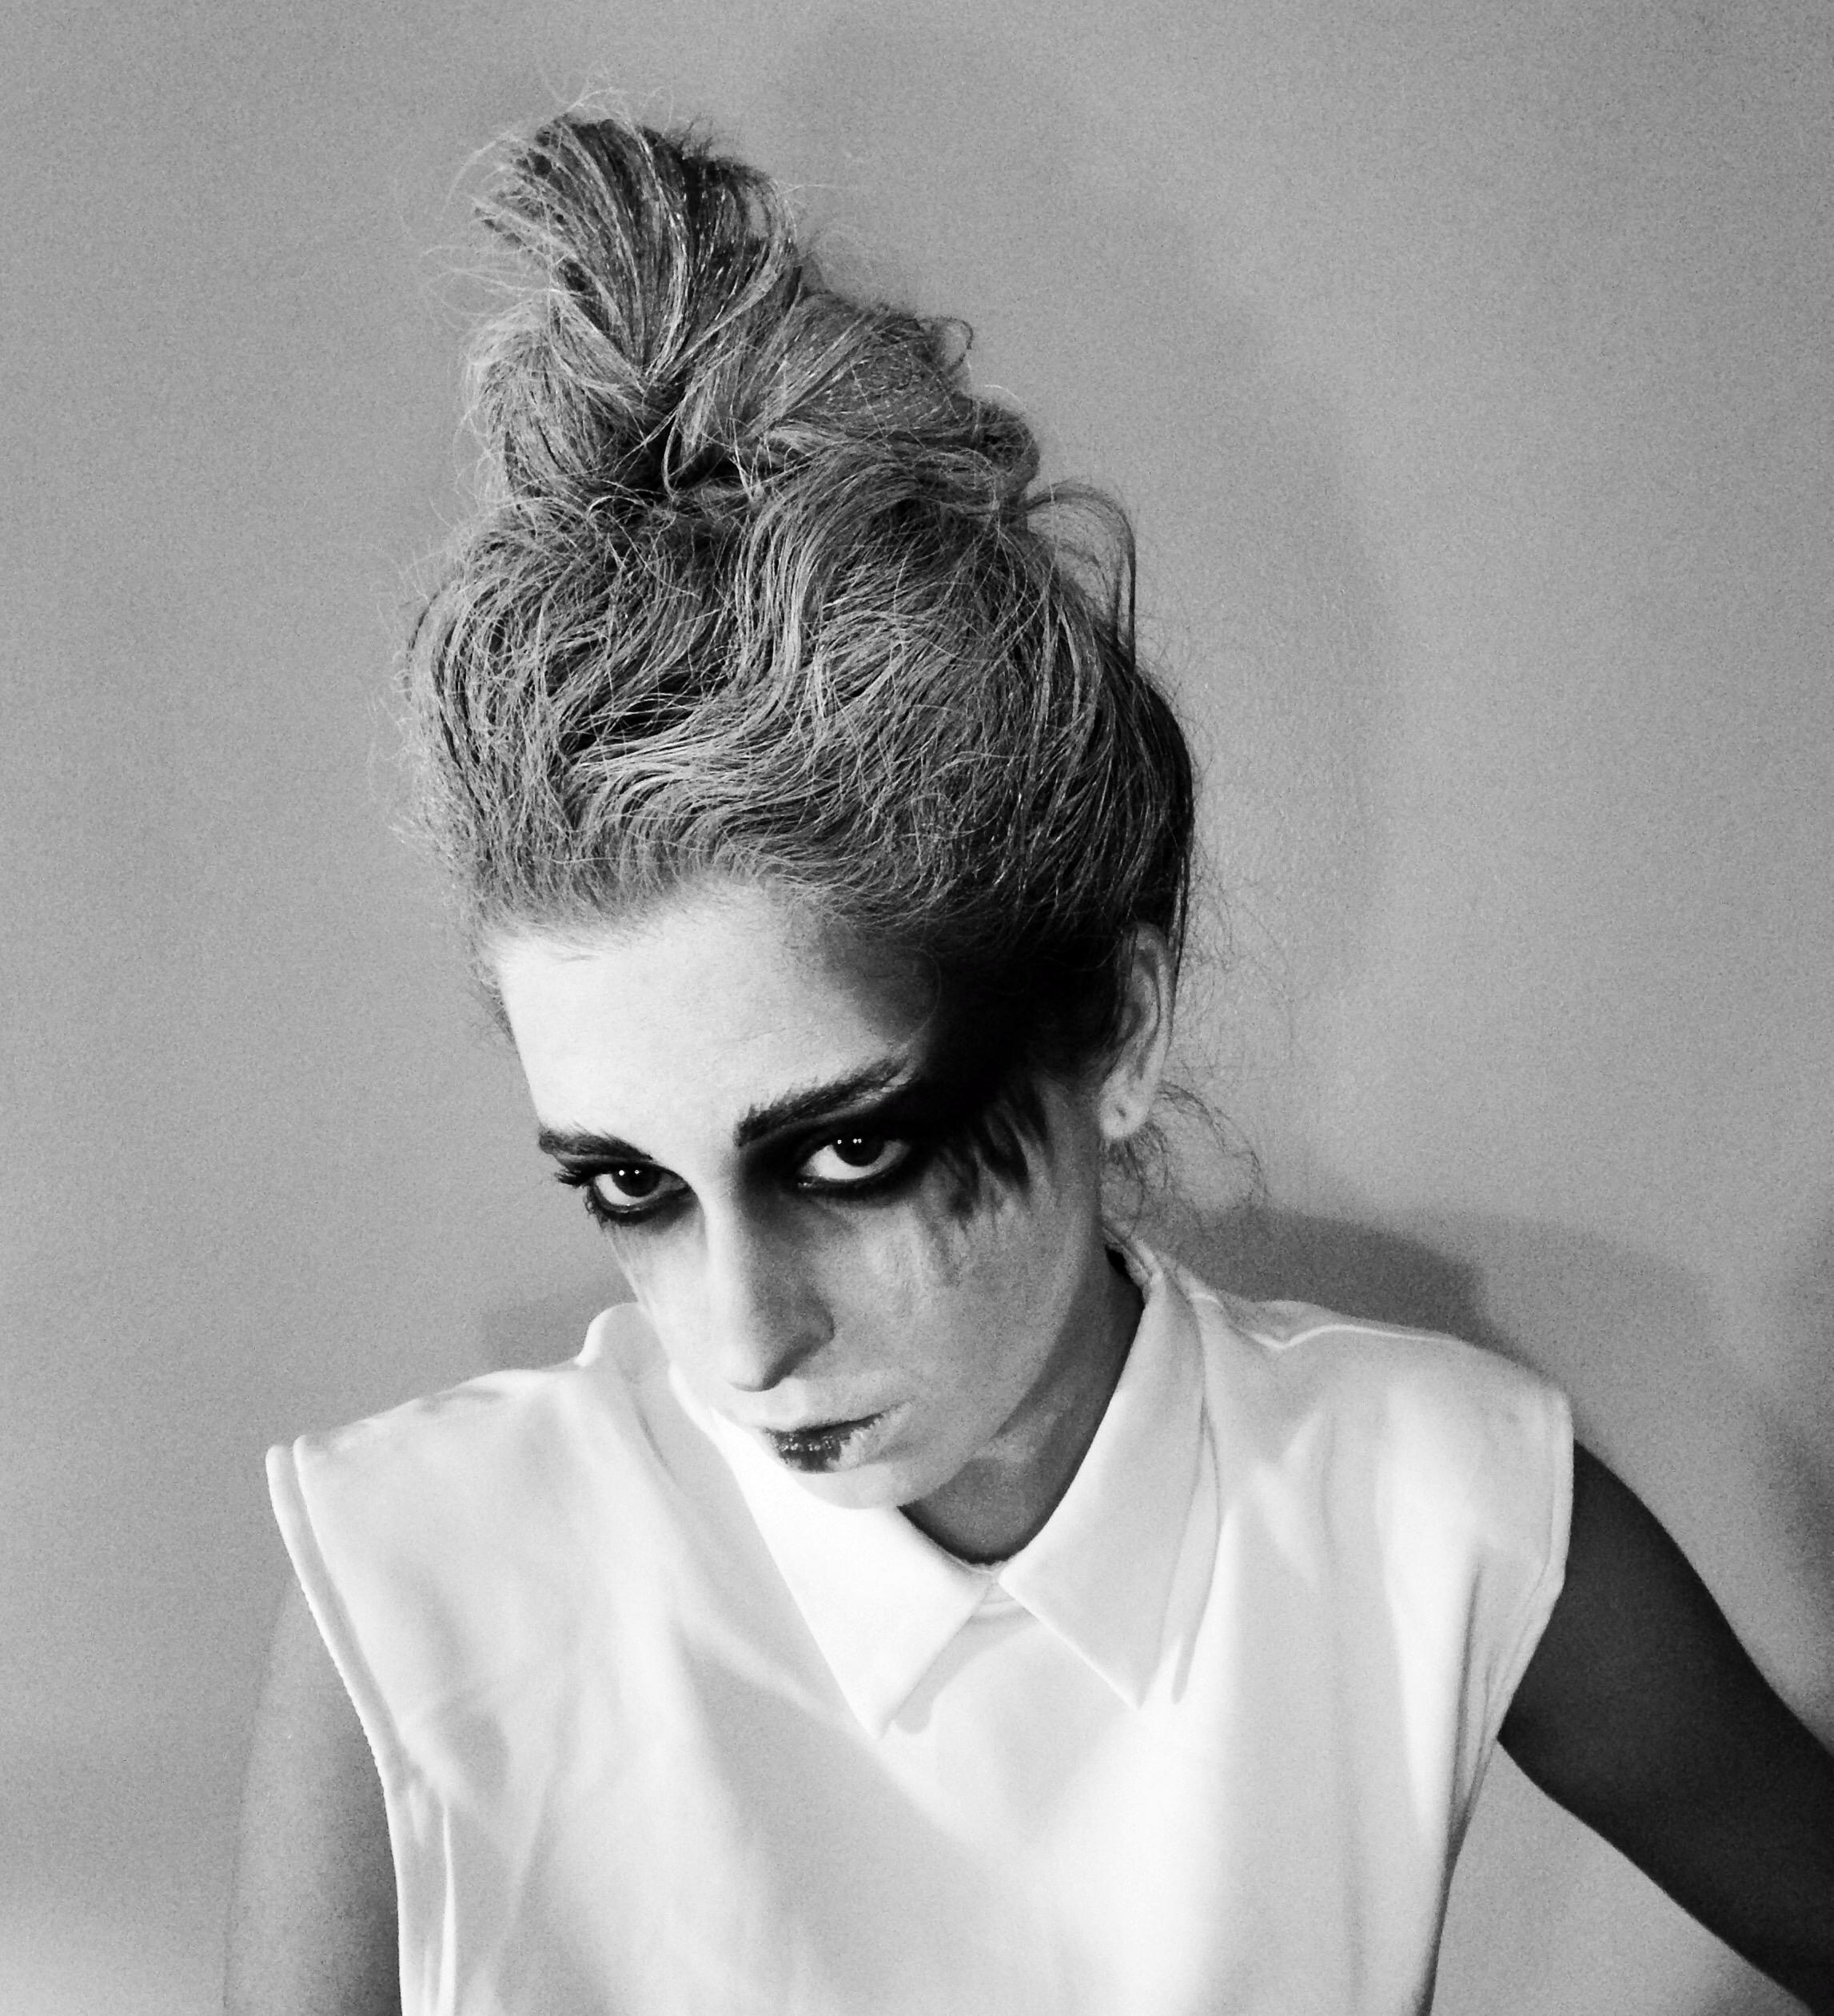 halloween-diy-makeup-ghost-art-zombie-editorial-fashion-fun-mua-sfx-glam-gore-wow-costume-cosplay-wig-facepaint-blog.JPG